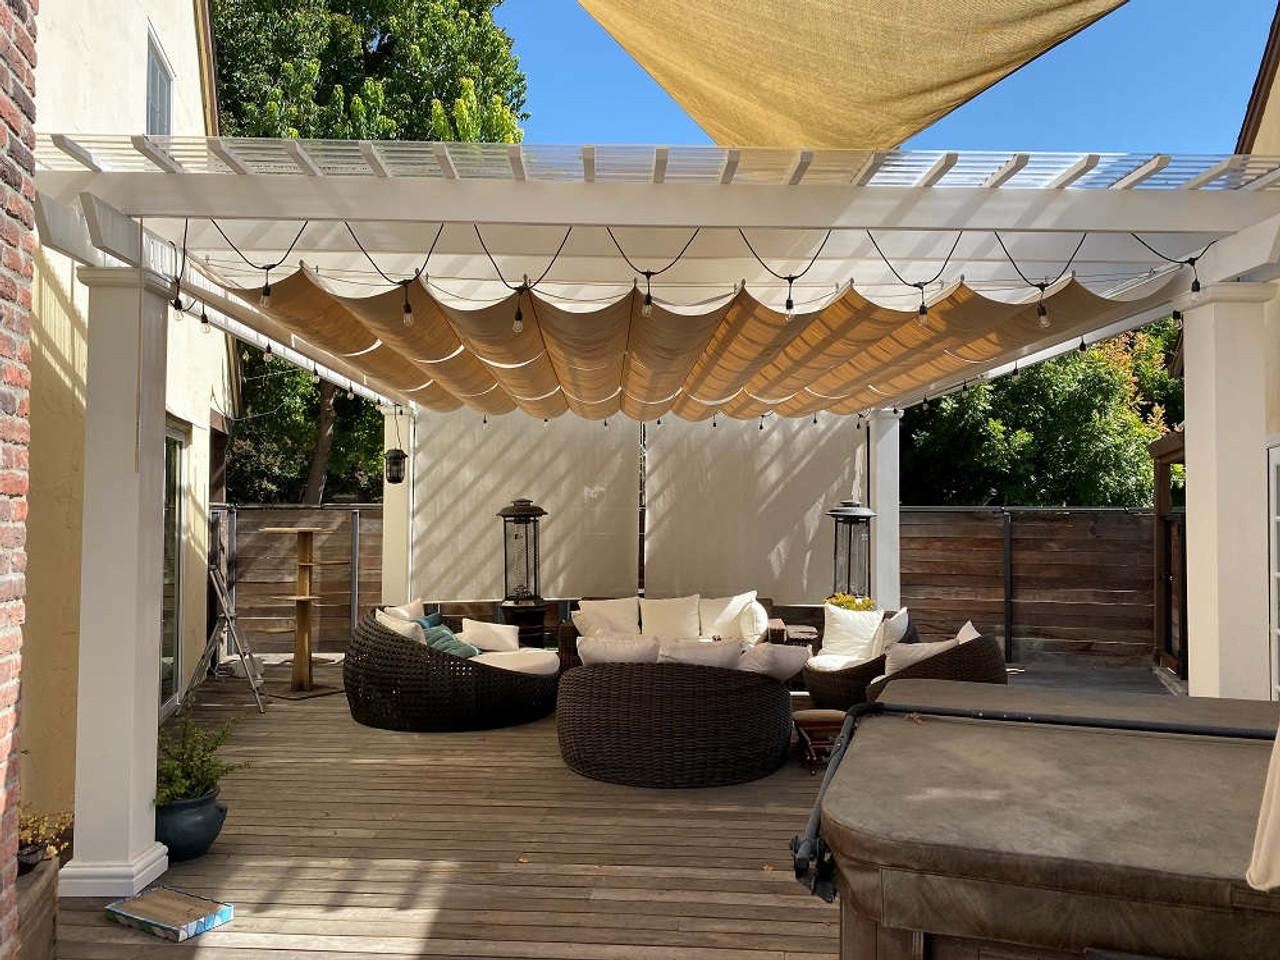 17x19 Structural Fiberglass Pergola Kit with canopy, San Jose, California